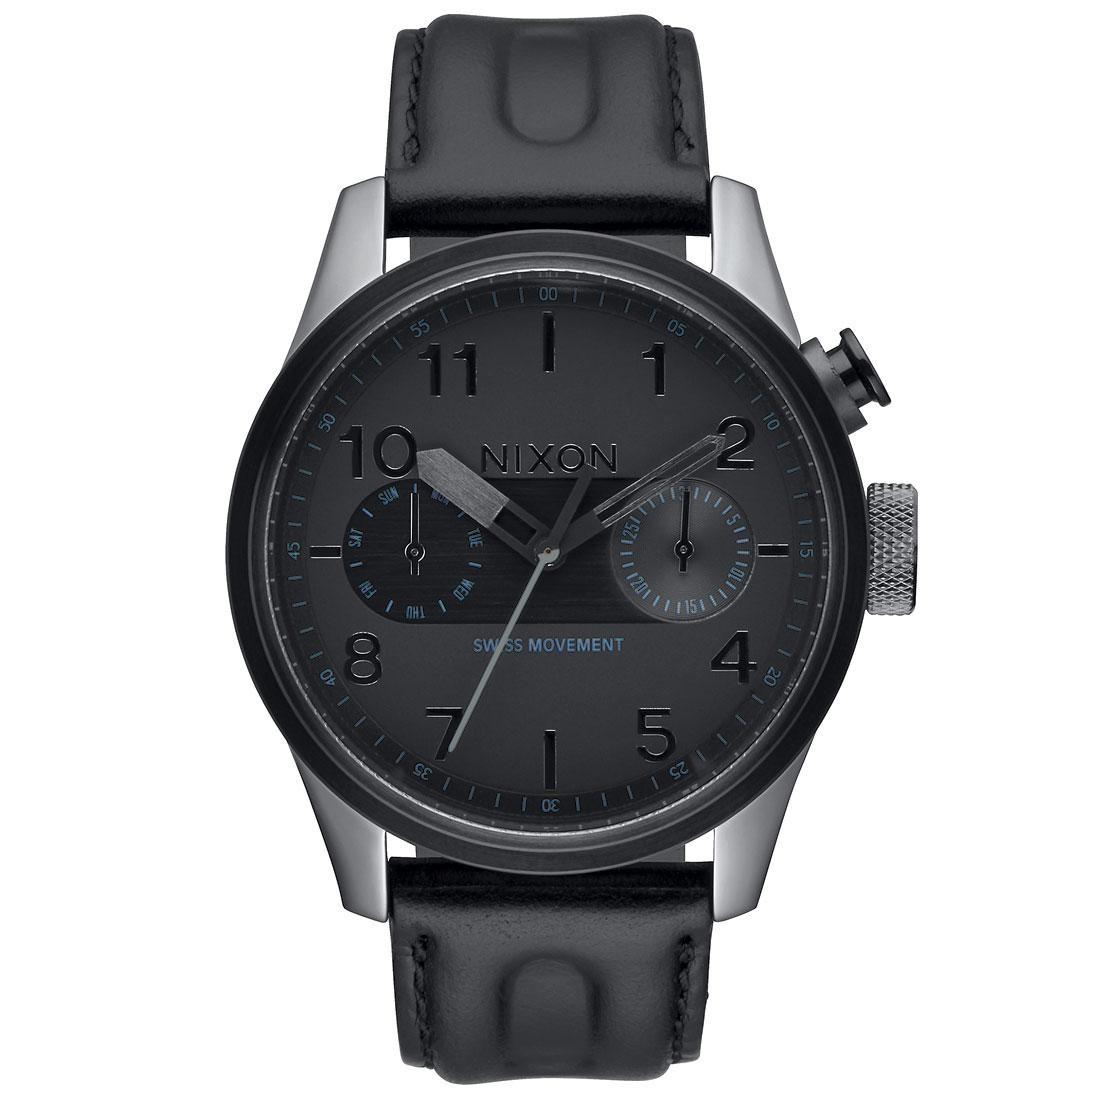 Nixon Safari Deluxe Leather Watch (black / gunmetal)